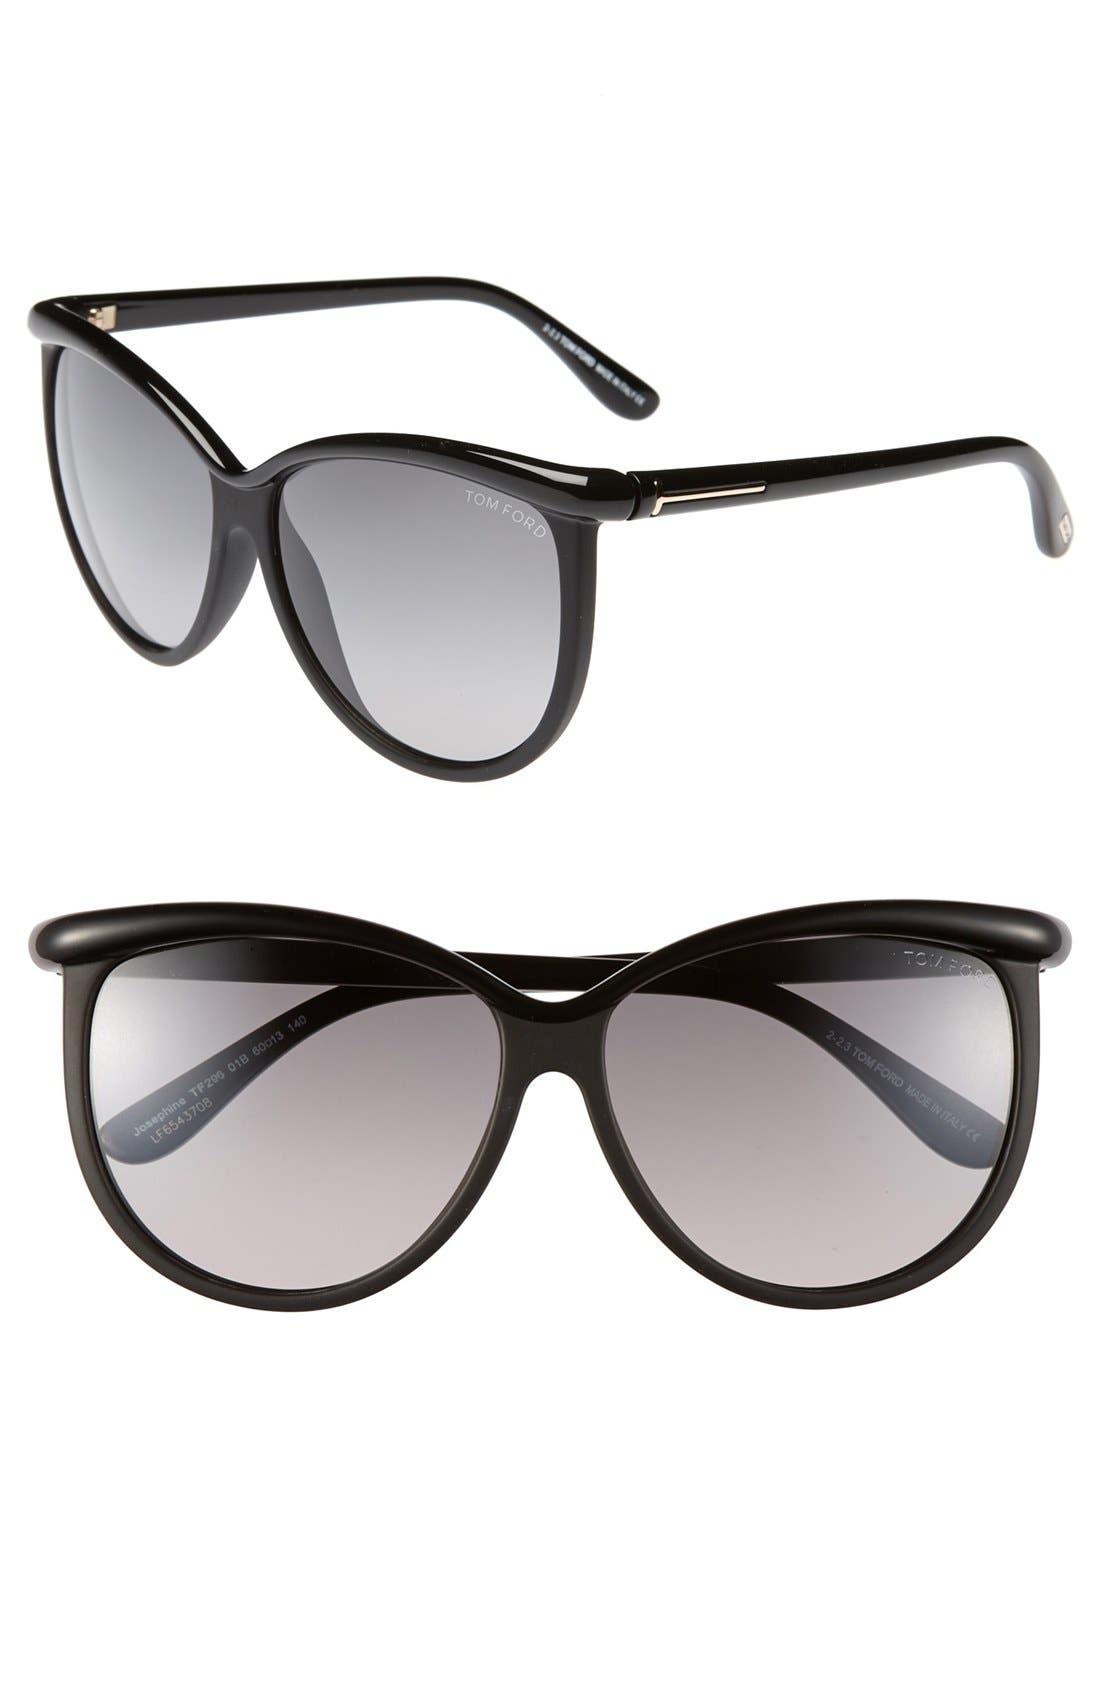 Alternate Image 1 Selected - Tom Ford 'Josephine' 60mm Sunglasses